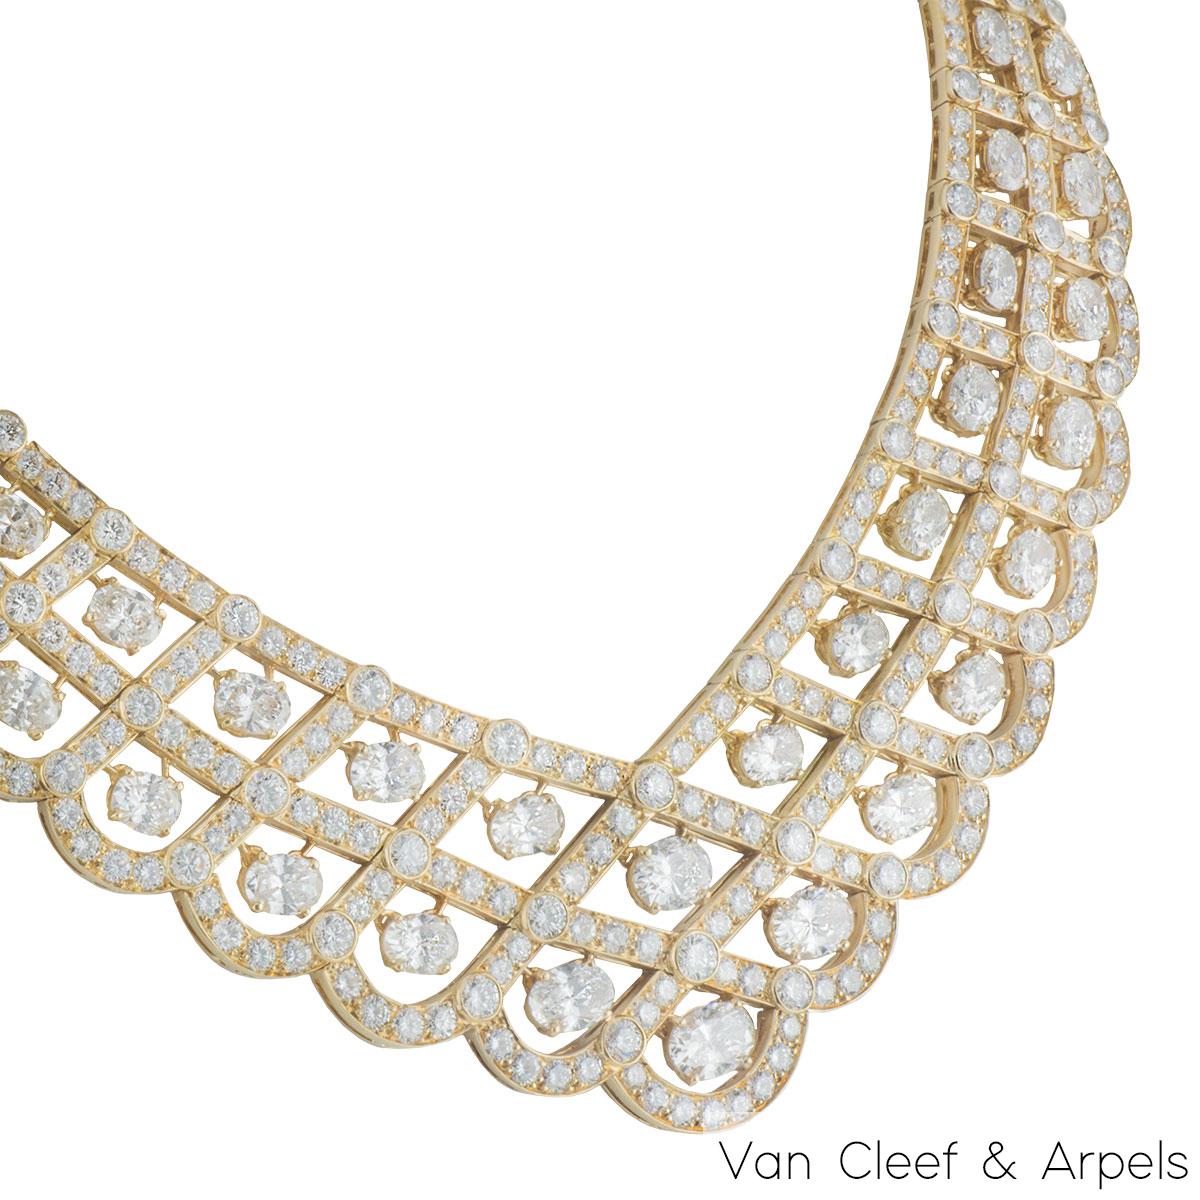 Van Cleef & Arpels Yellow Gold Diamond Vintage Bogota Necklace 57.40ct F-G/VS-VVS